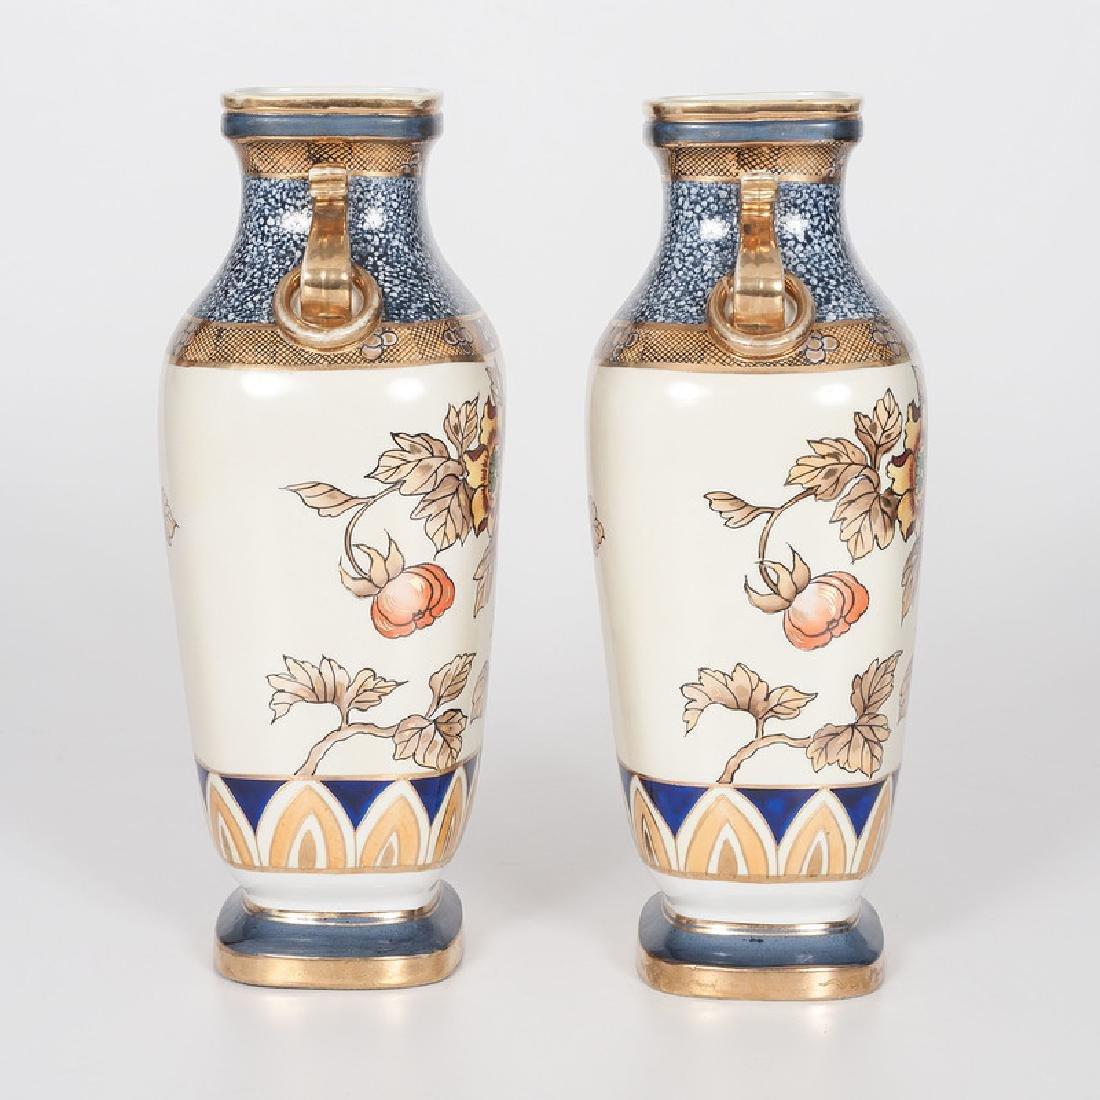 Noritake Hand-Painted Vases - 2